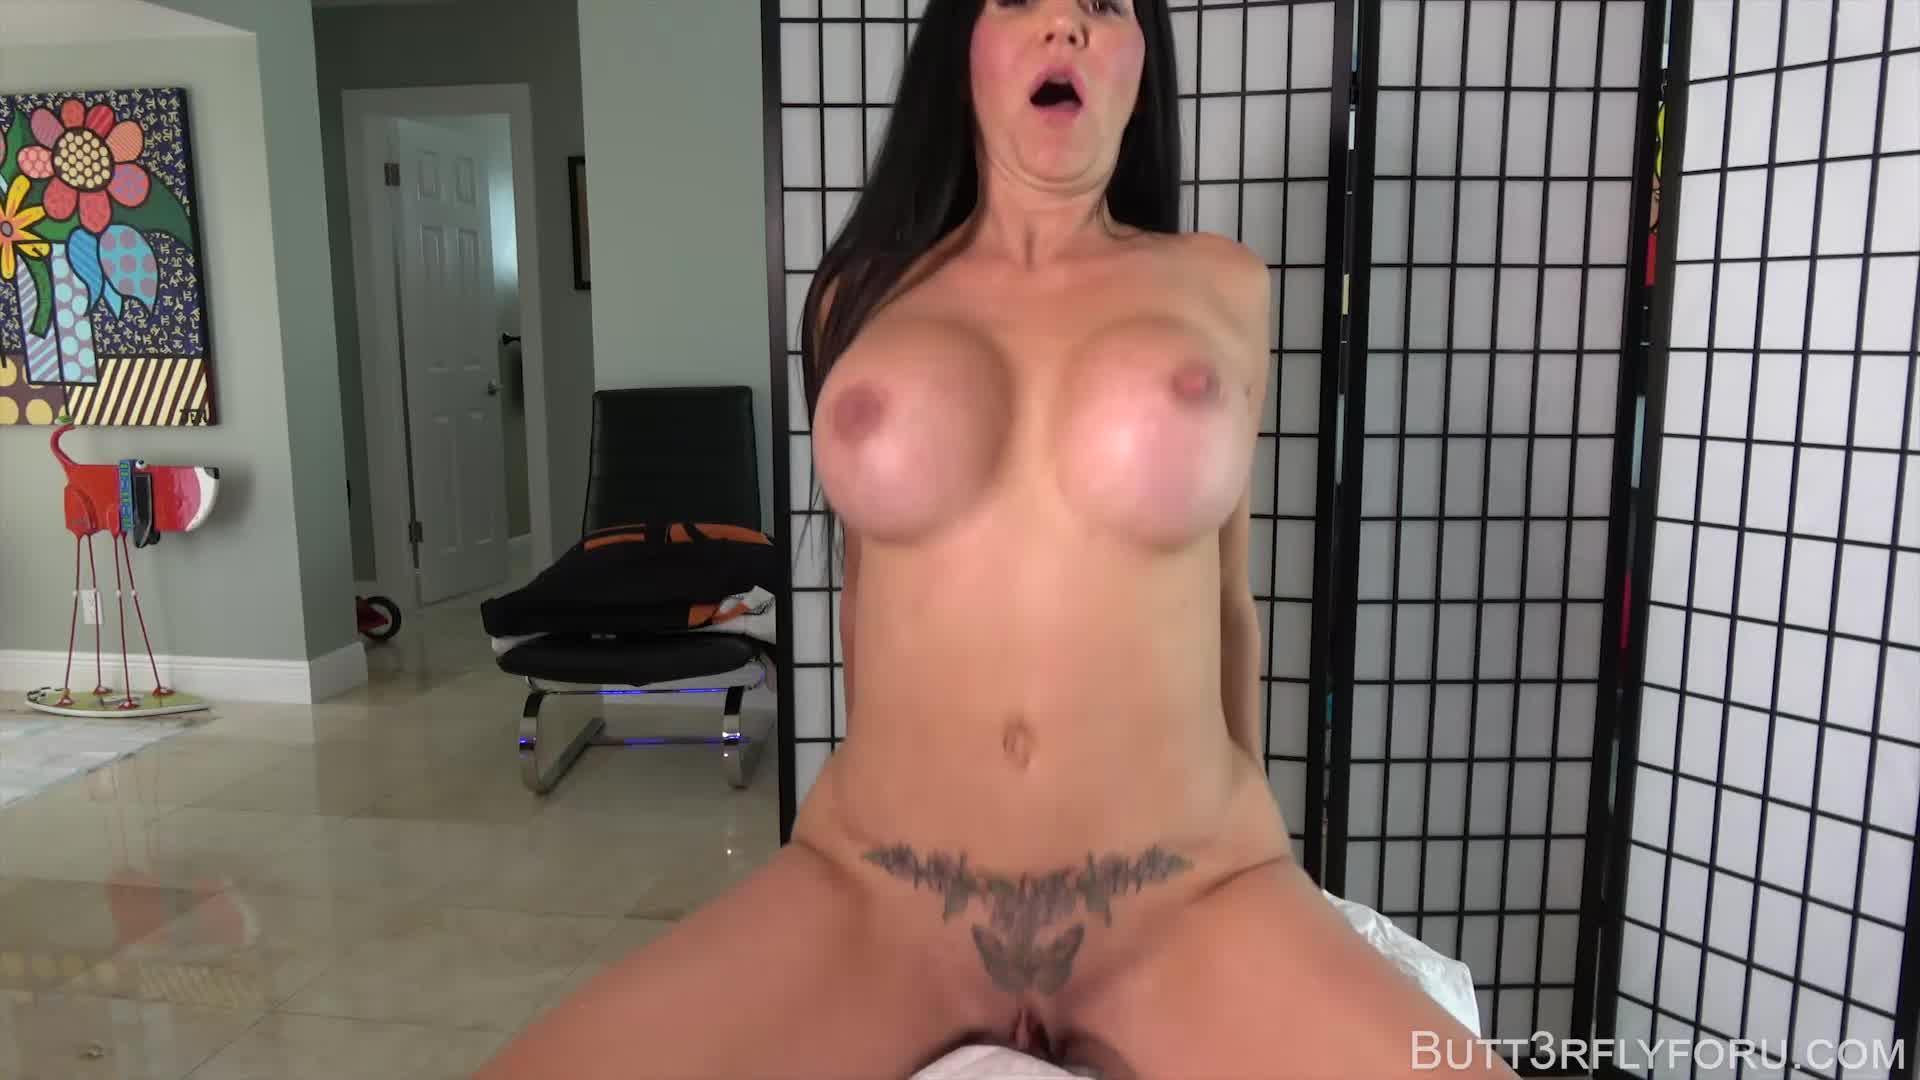 """Butt3rflyforu"" (MILFs, Older Woman / Younger Man ., Virtual Sex, Creampie, Impregnation Fantasy) Happy Ending Massage-MP4-1080p - ManyVids Production"